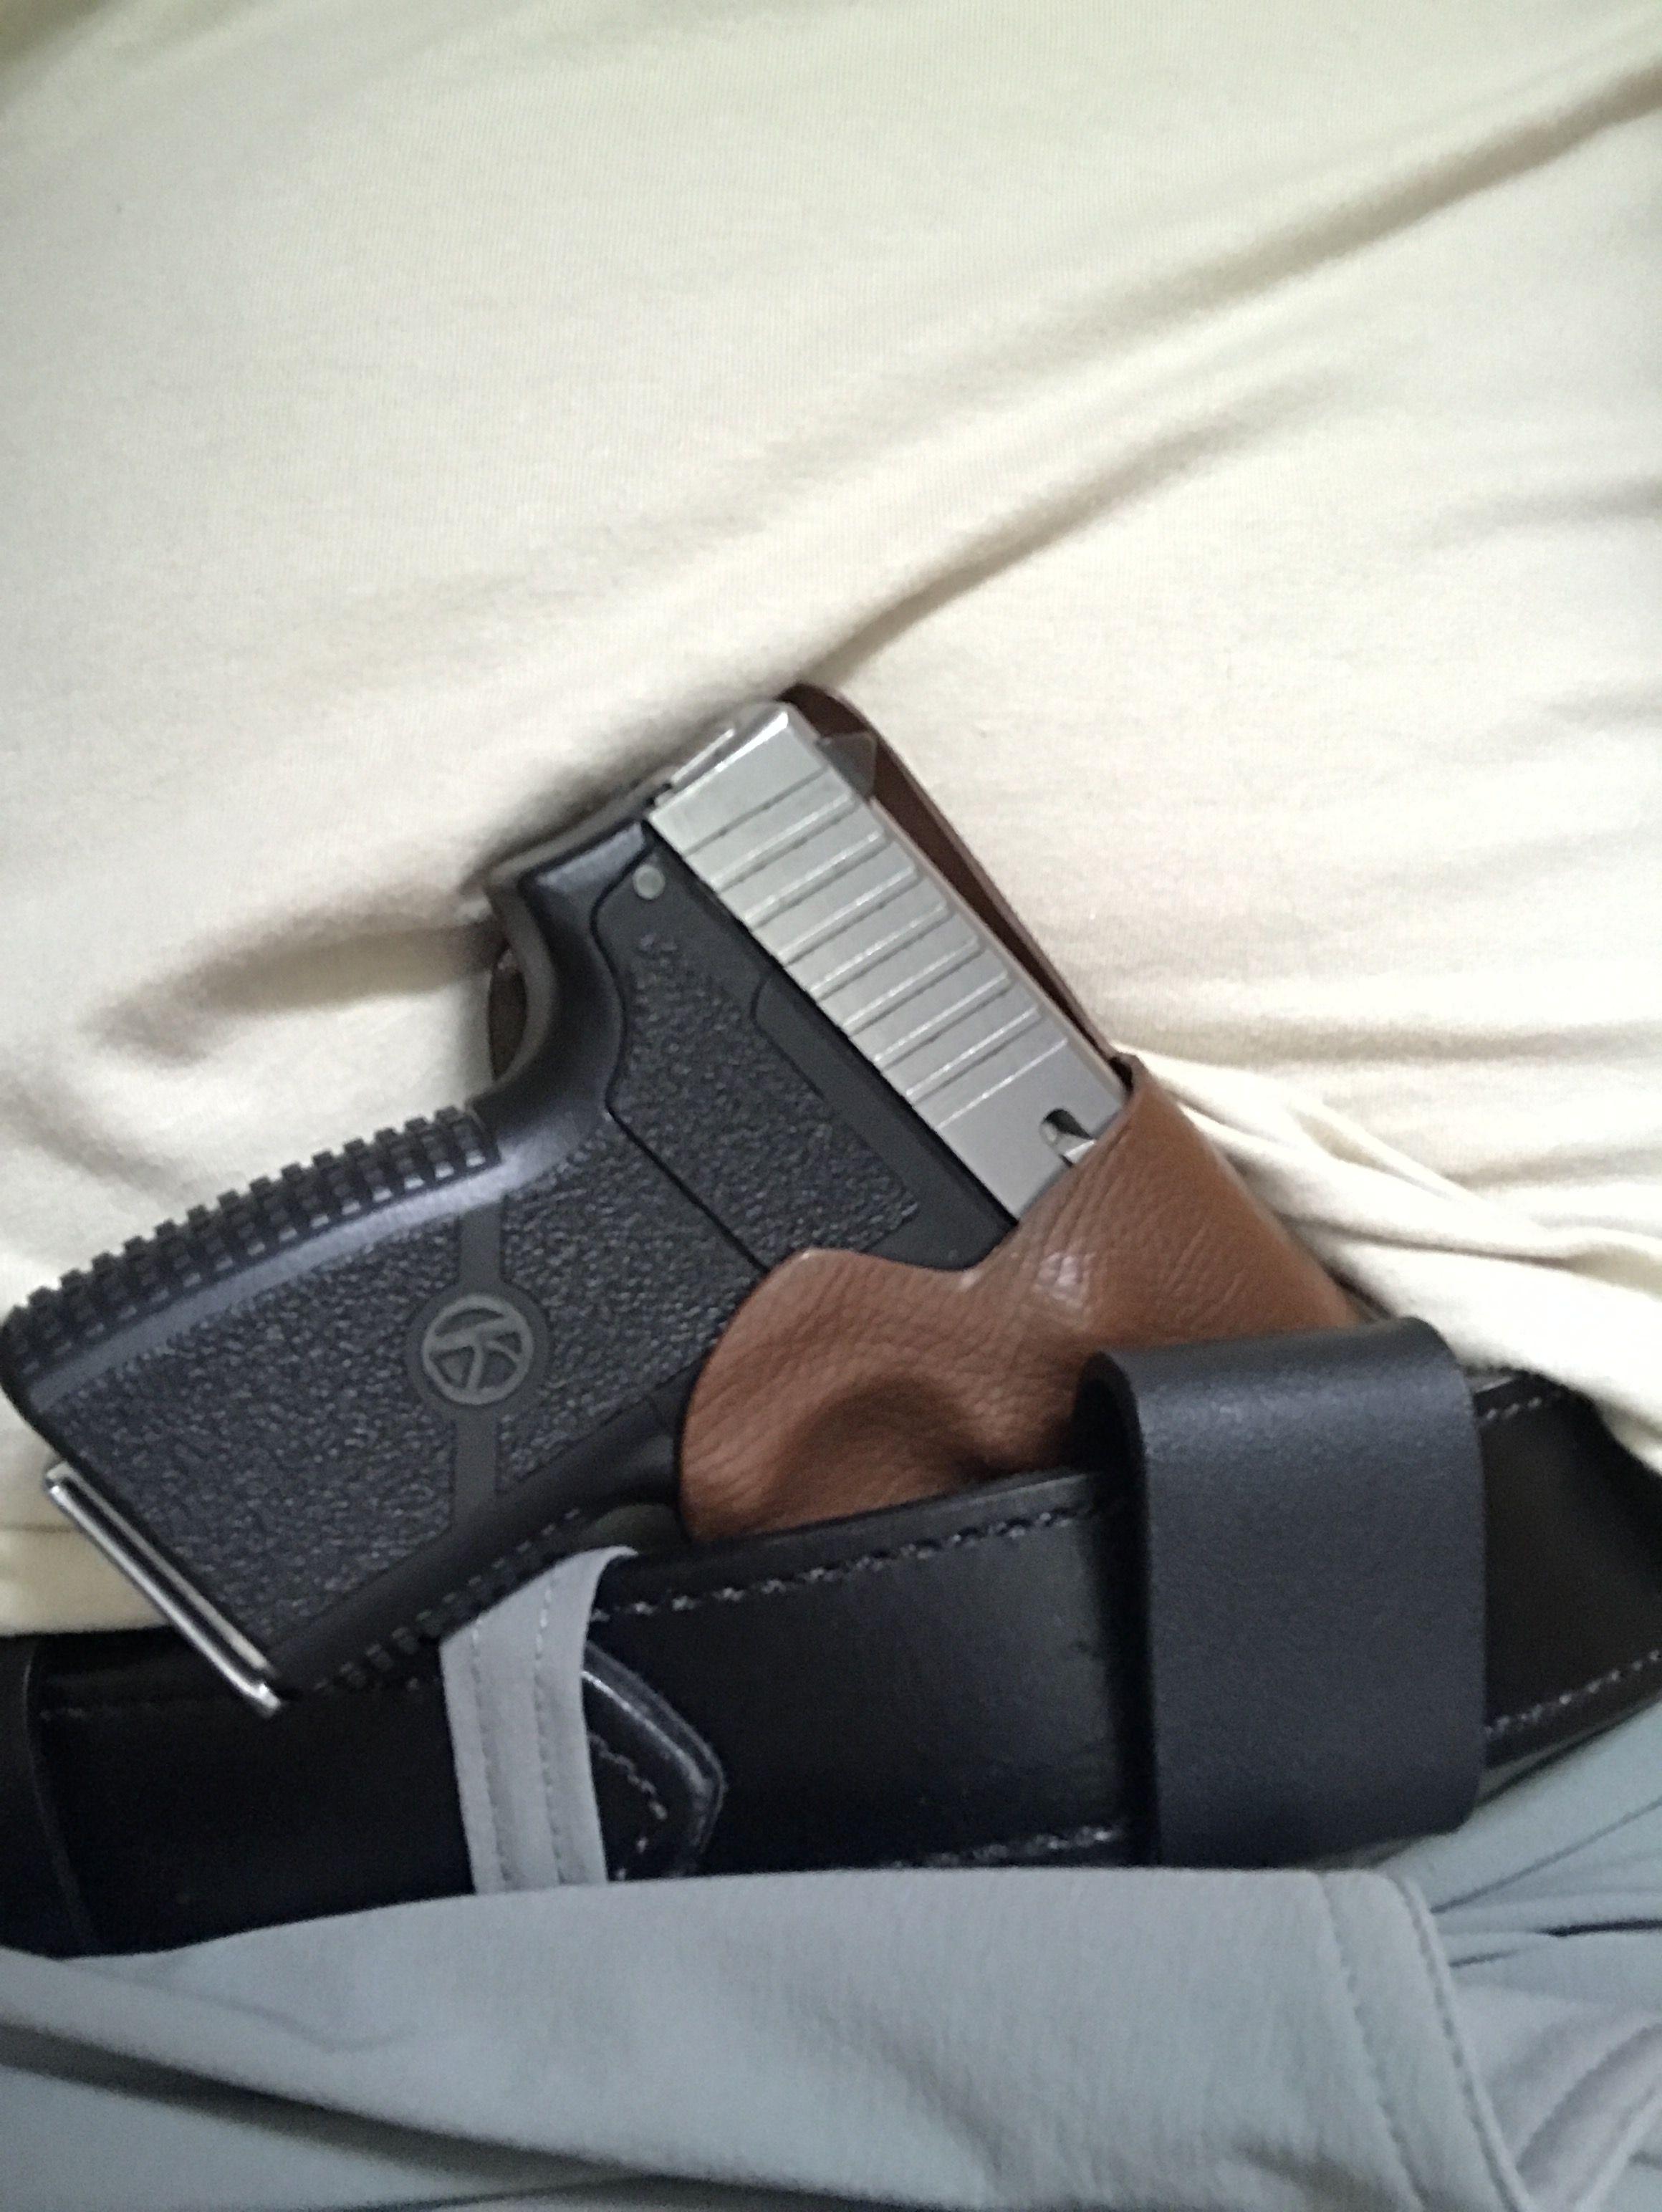 Cross Draw Kahr PM9 | GARP holsters | Hand guns, Guns, Drawings